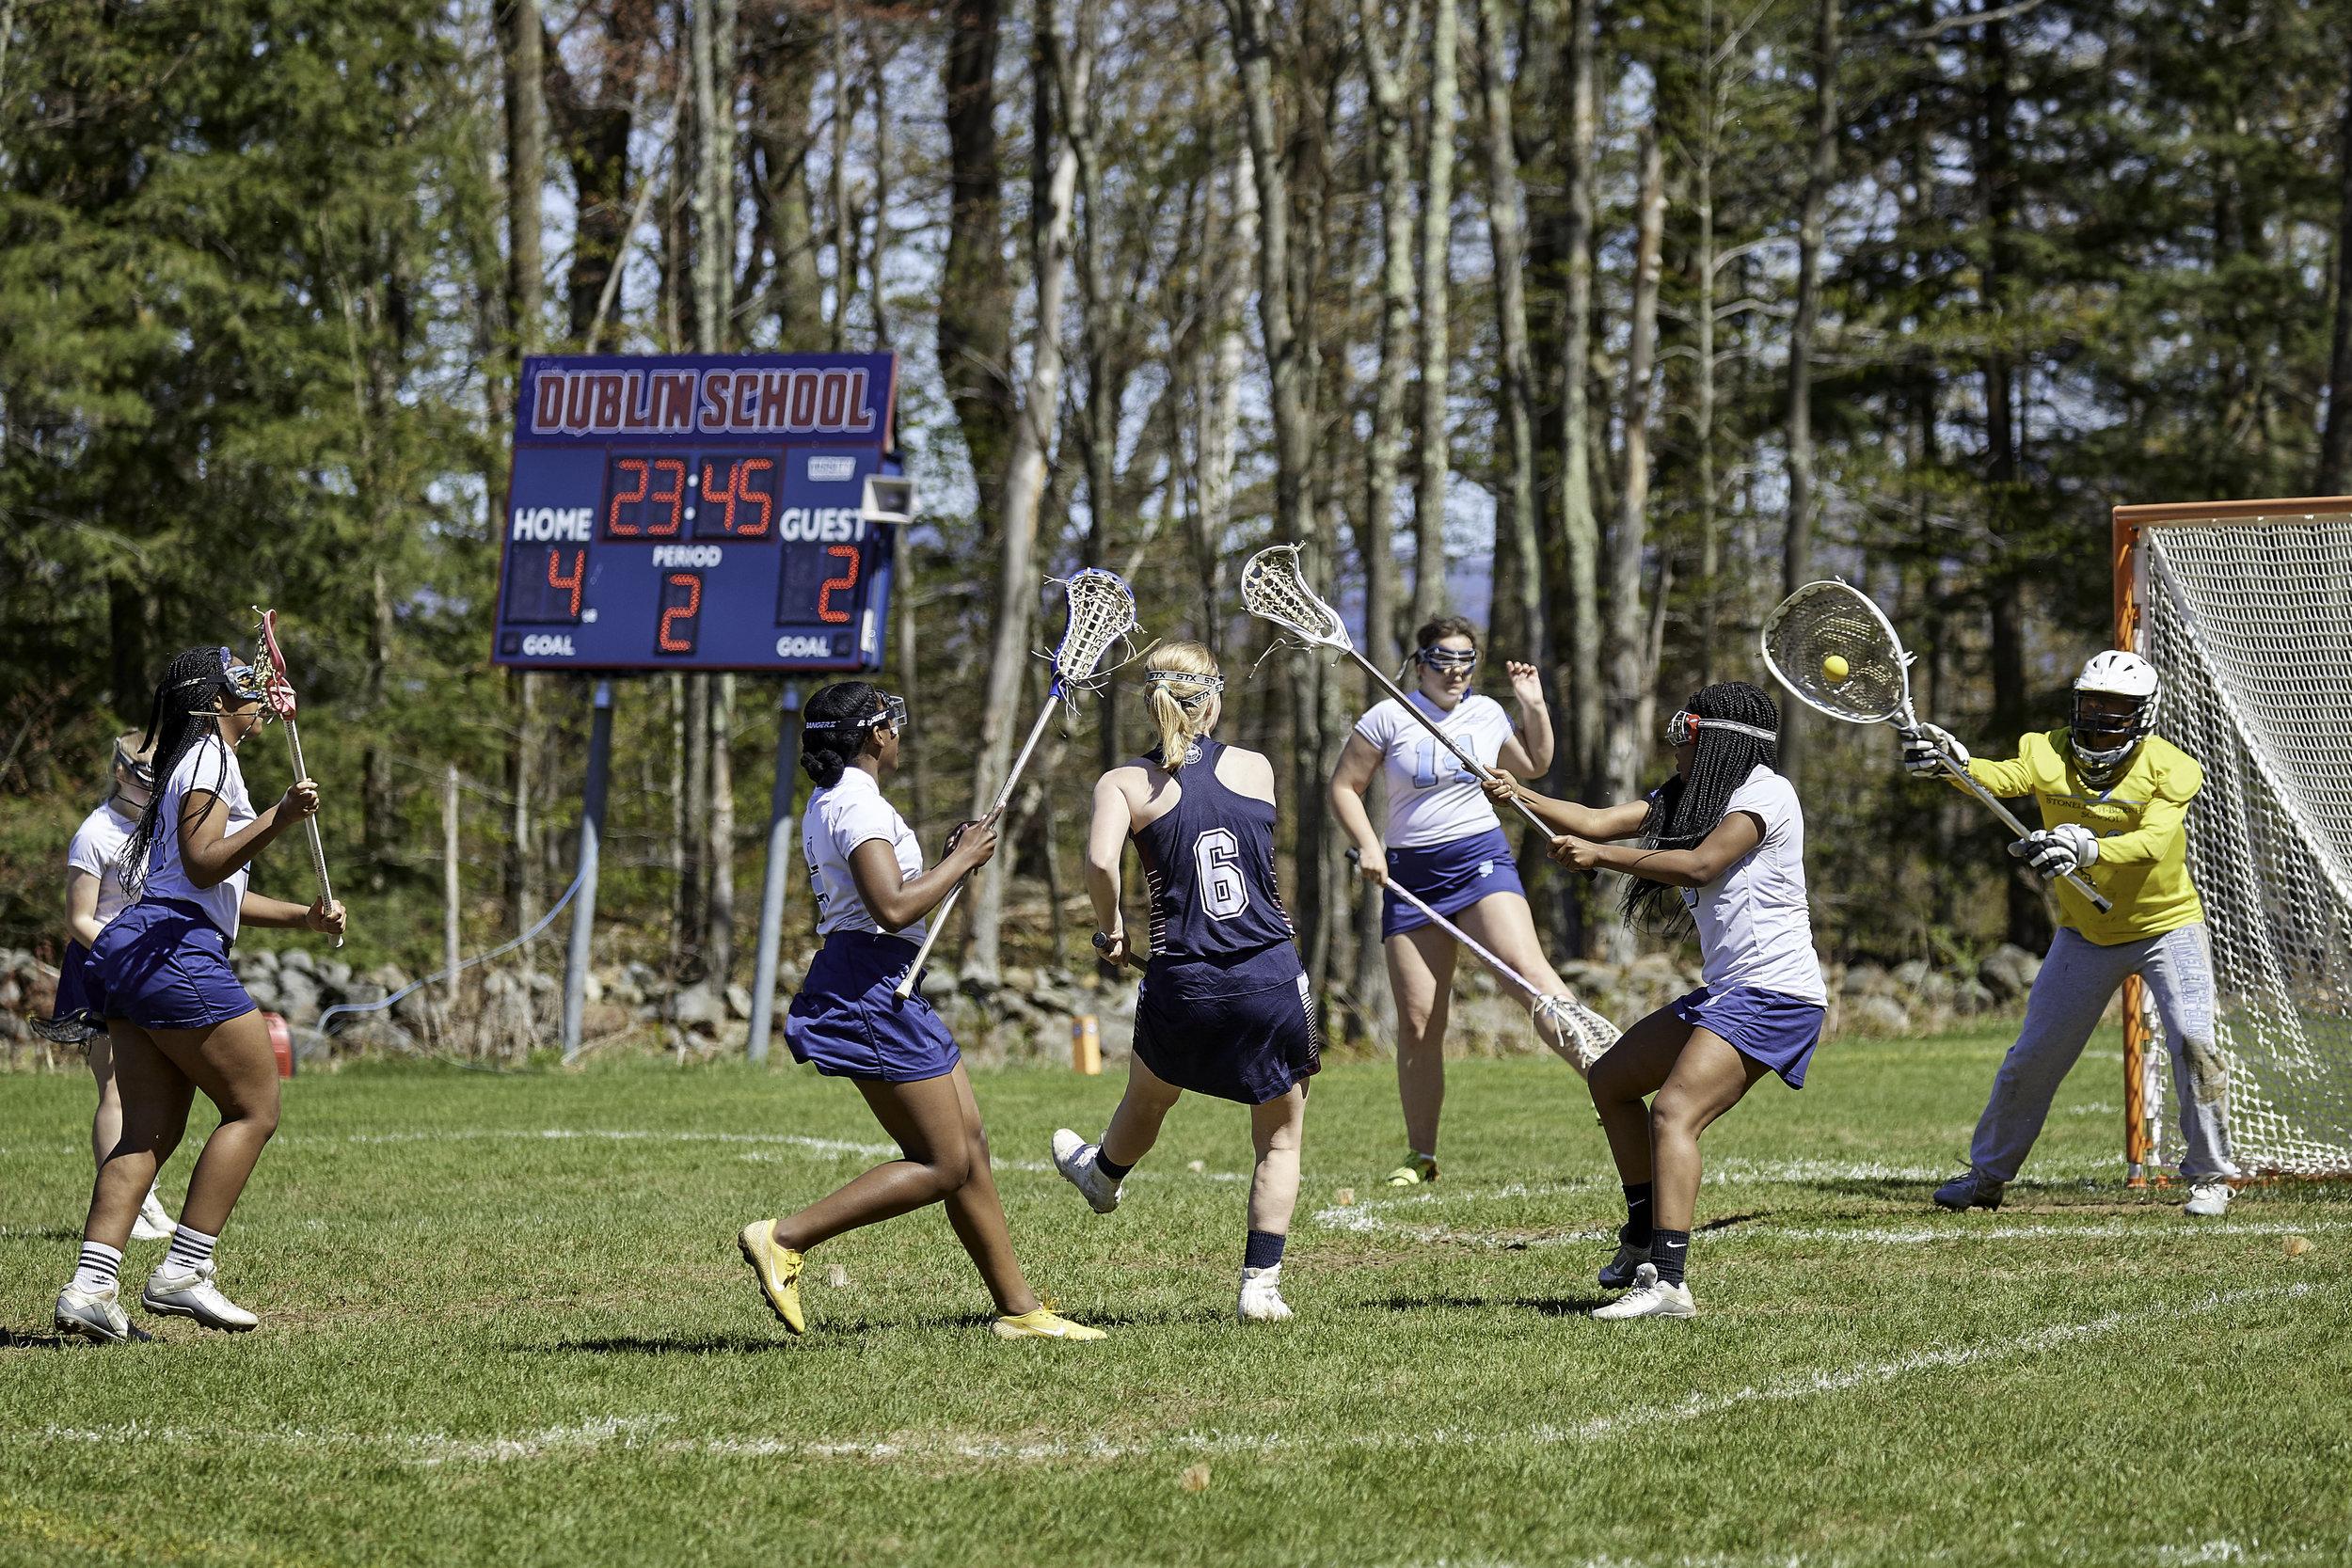 Girls Lacrosse vs. Stoneleigh Burnham School - May 11, 2019 - May 10, 2019193299.jpg